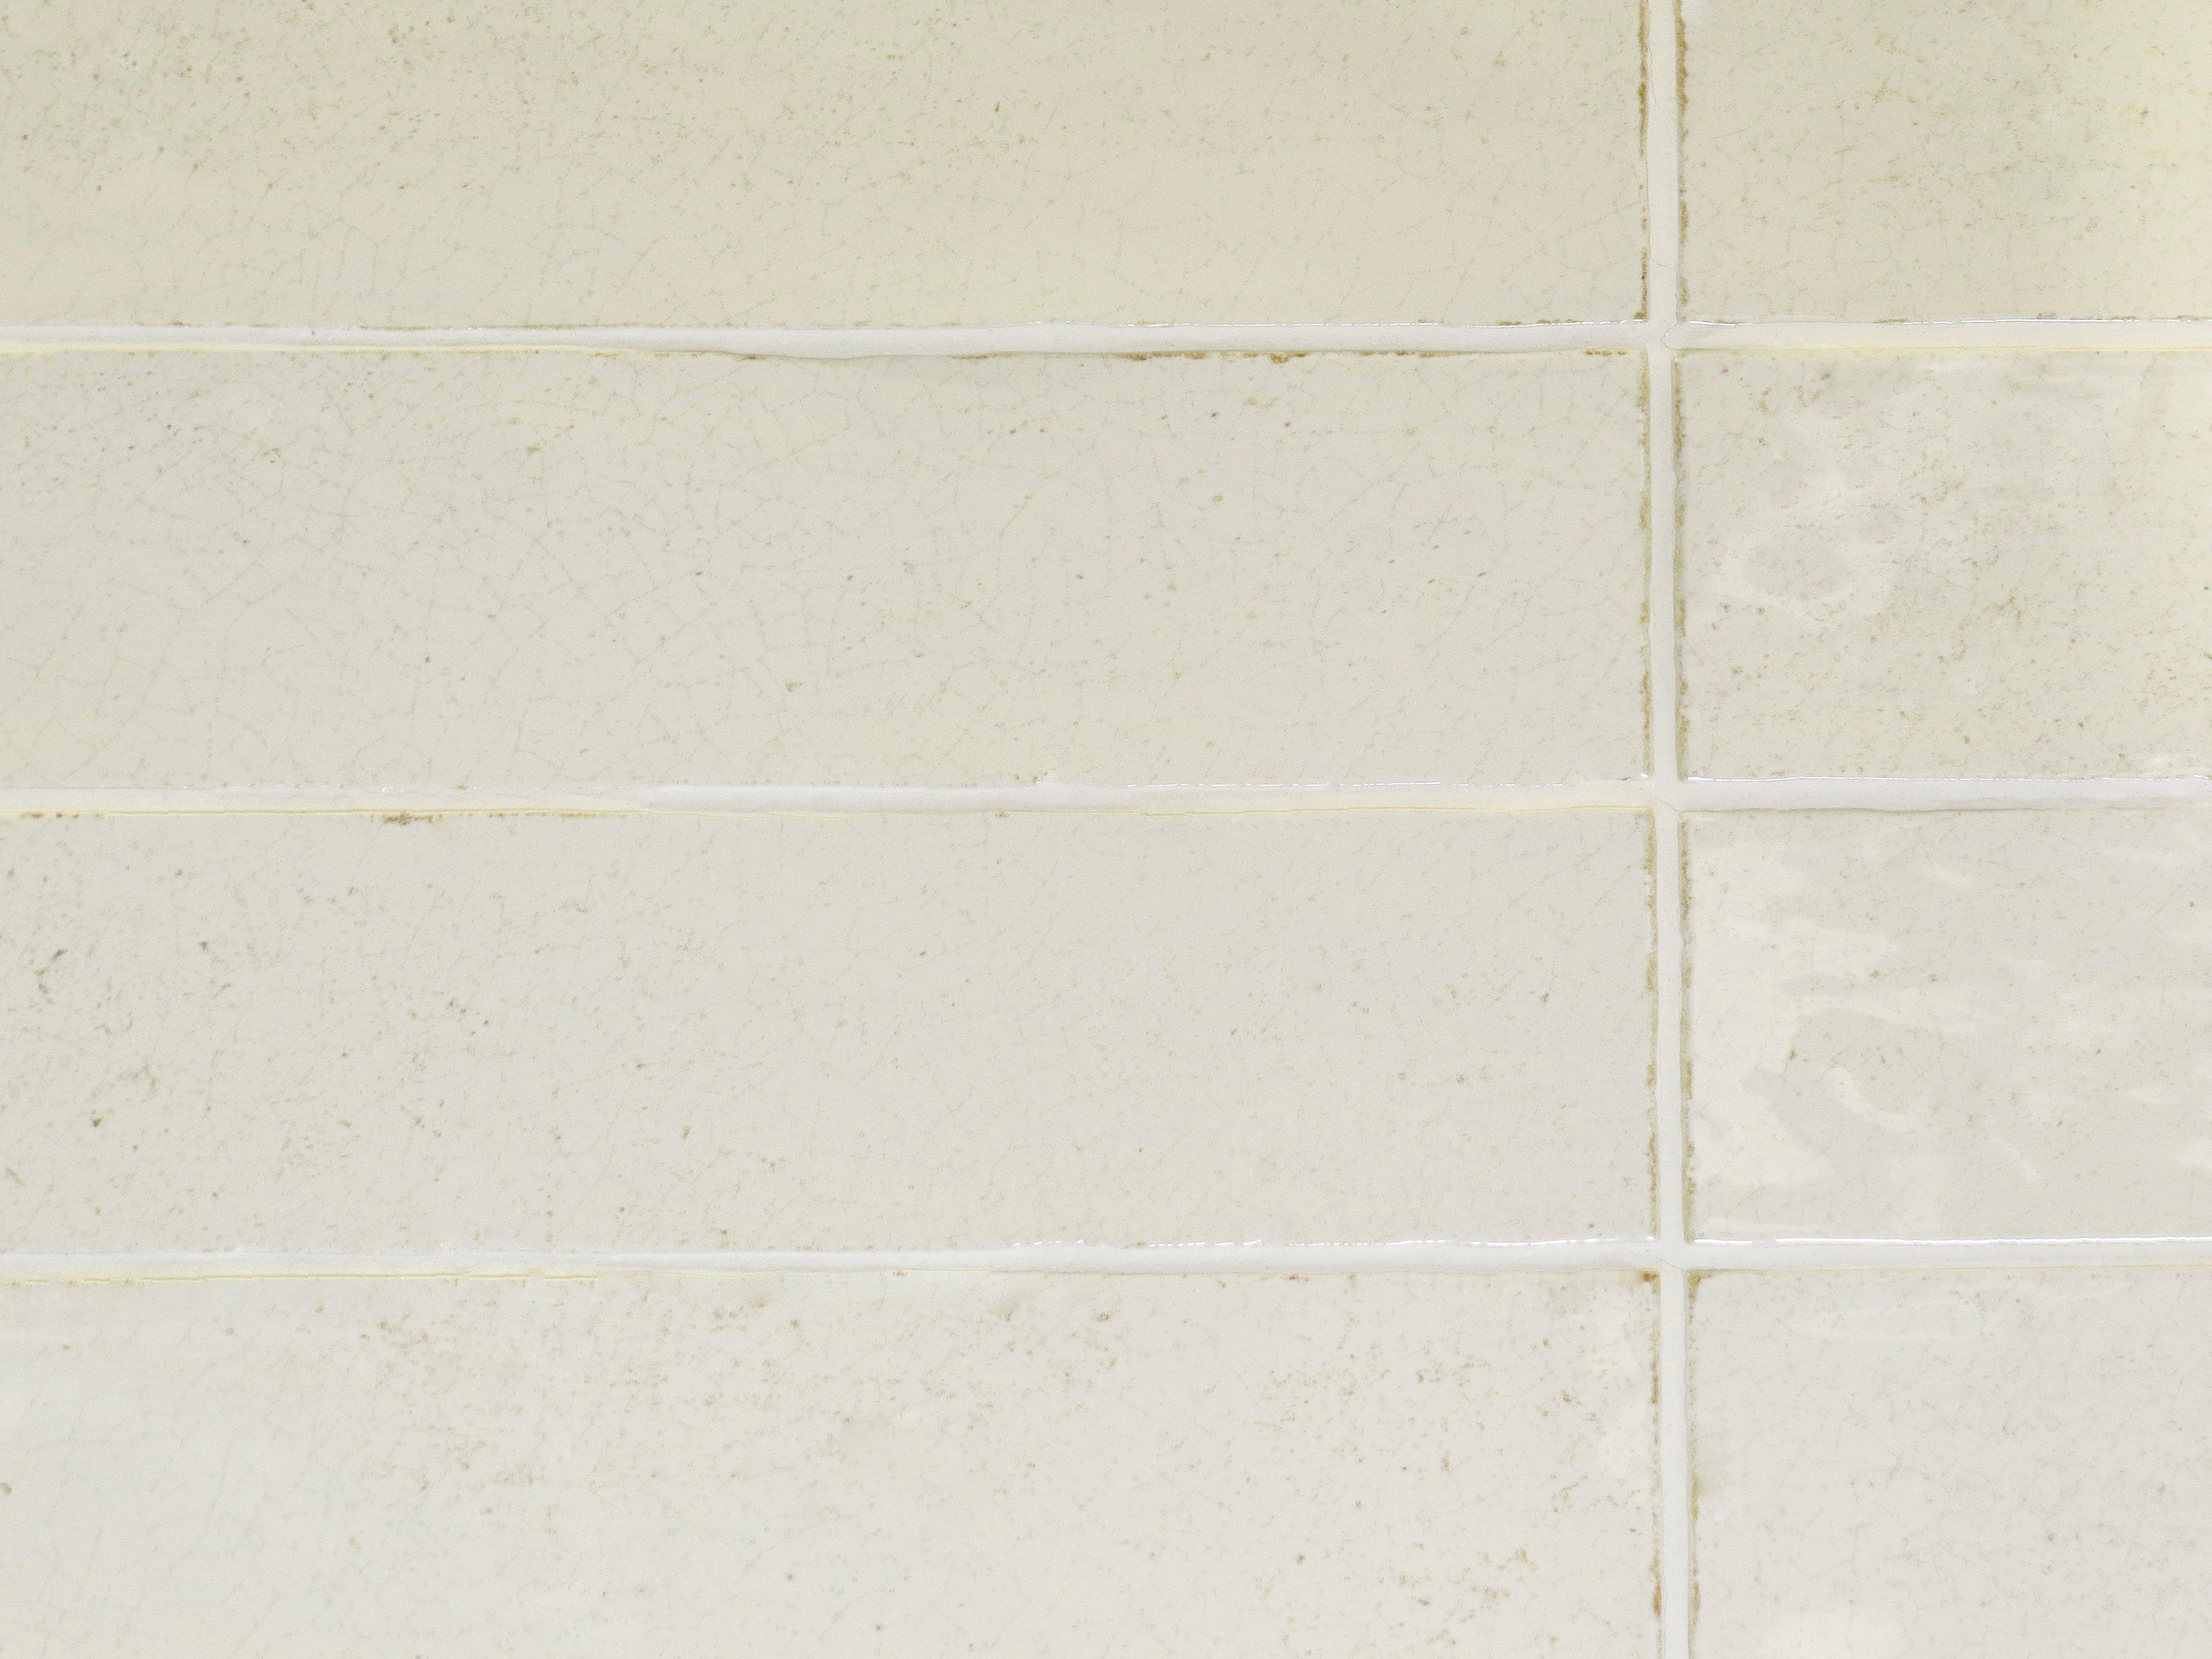 Maiolica Crackled Biscuit 3x12 Pcc Tile Professional